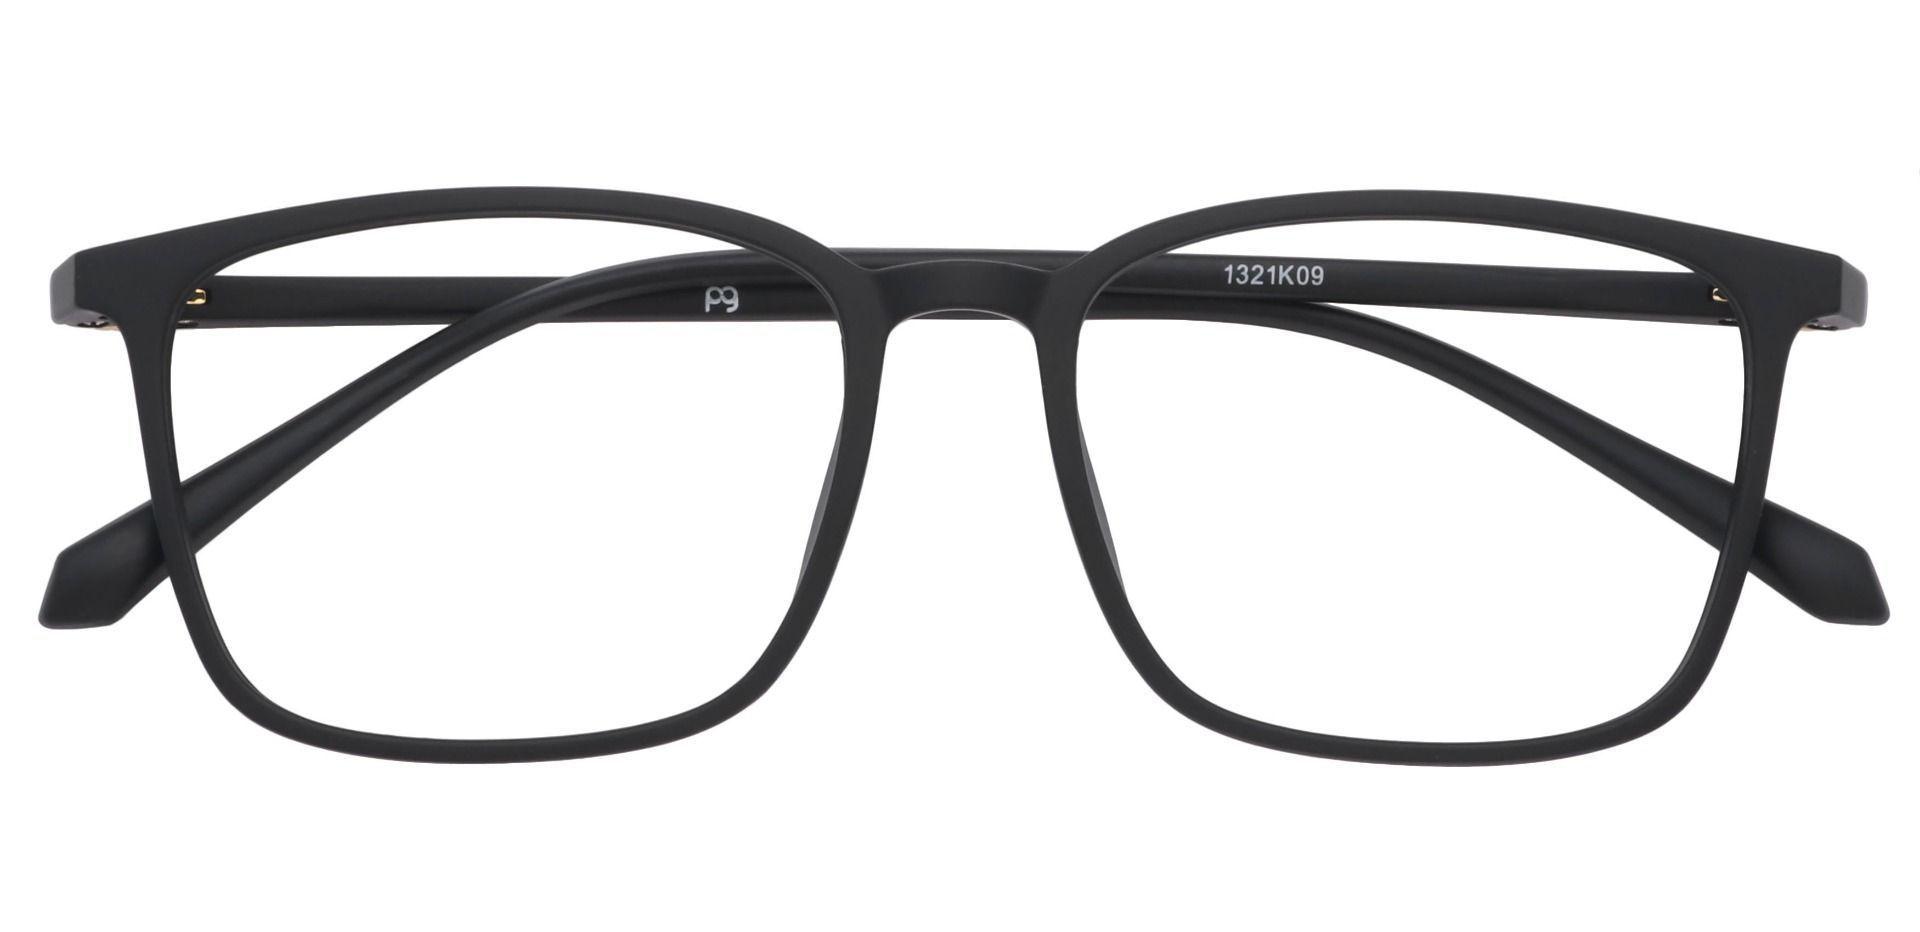 Hayworth Rectangle Reading Glasses - Black